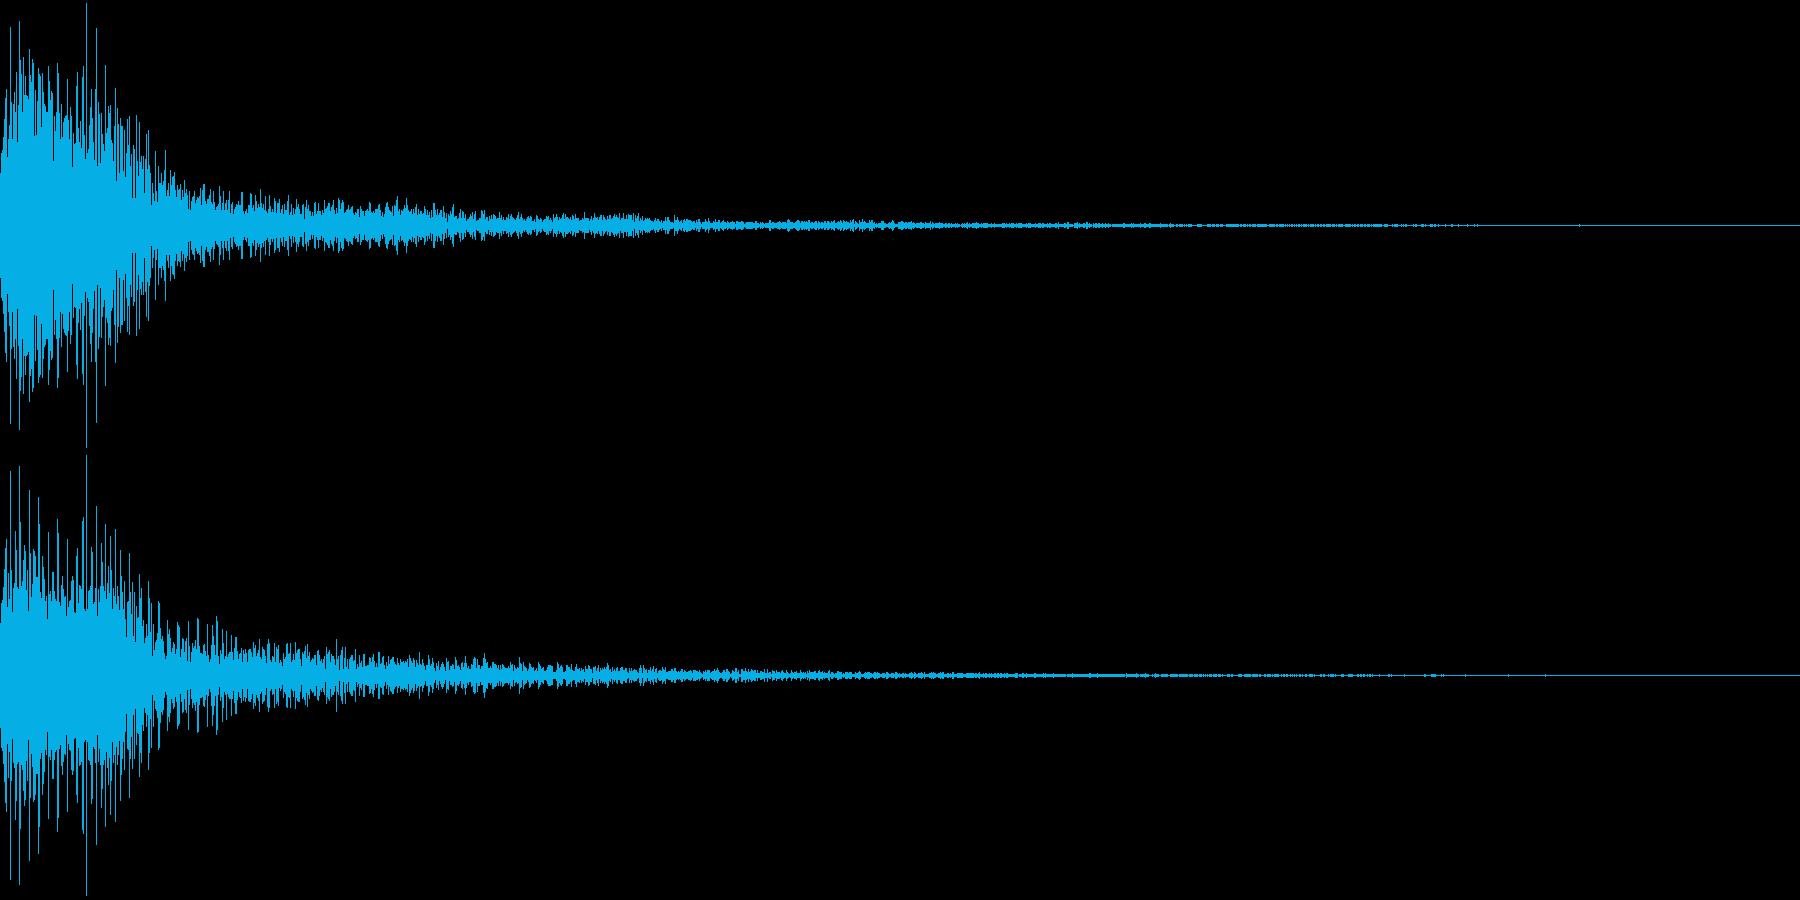 Moog ファットなコマンド音 4の再生済みの波形